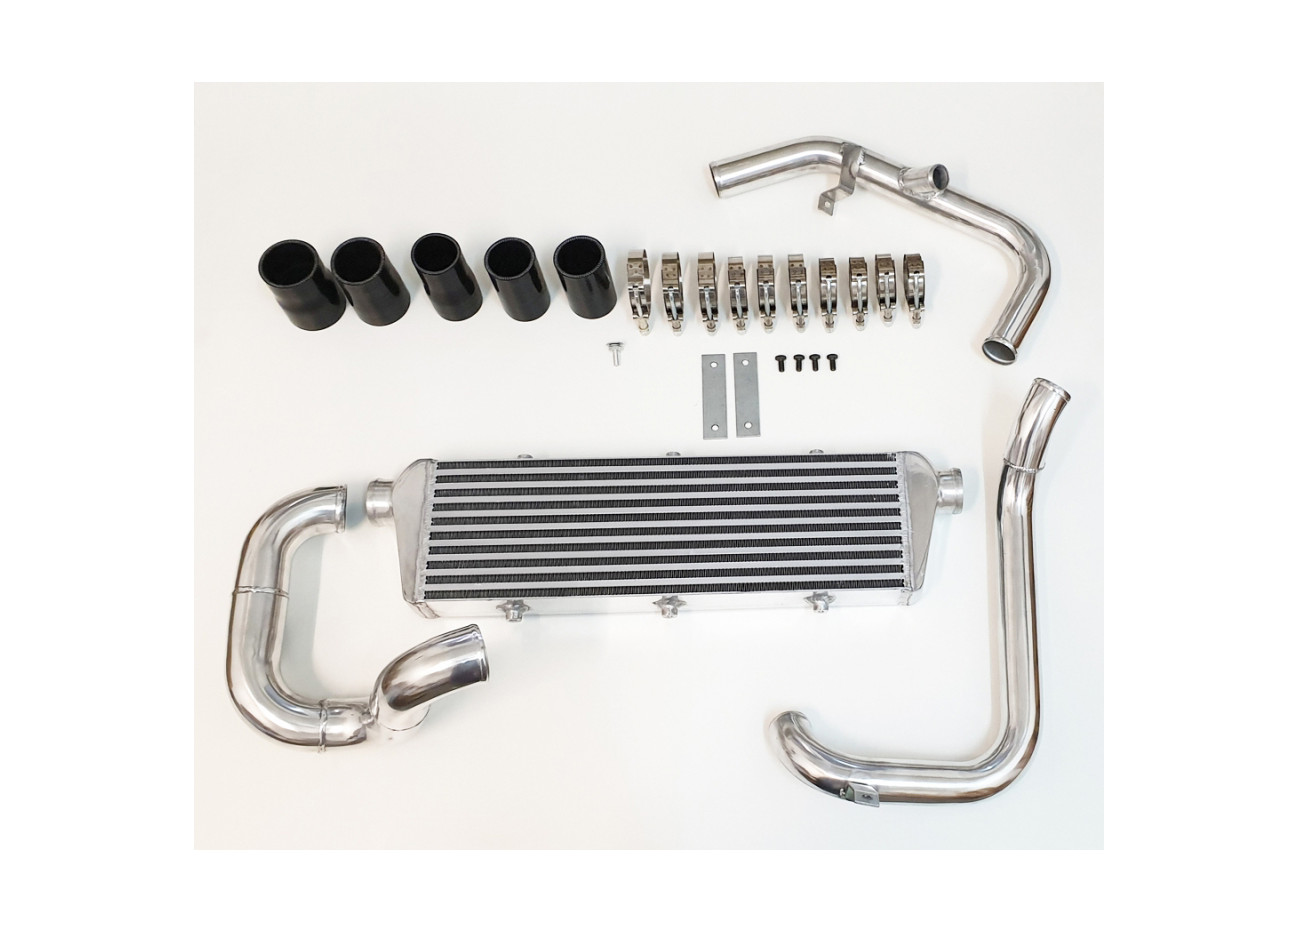 Intercooler Kit VAG 1.8T (VW Golf 4, VW Bora, Audi A3, Seat Leon)